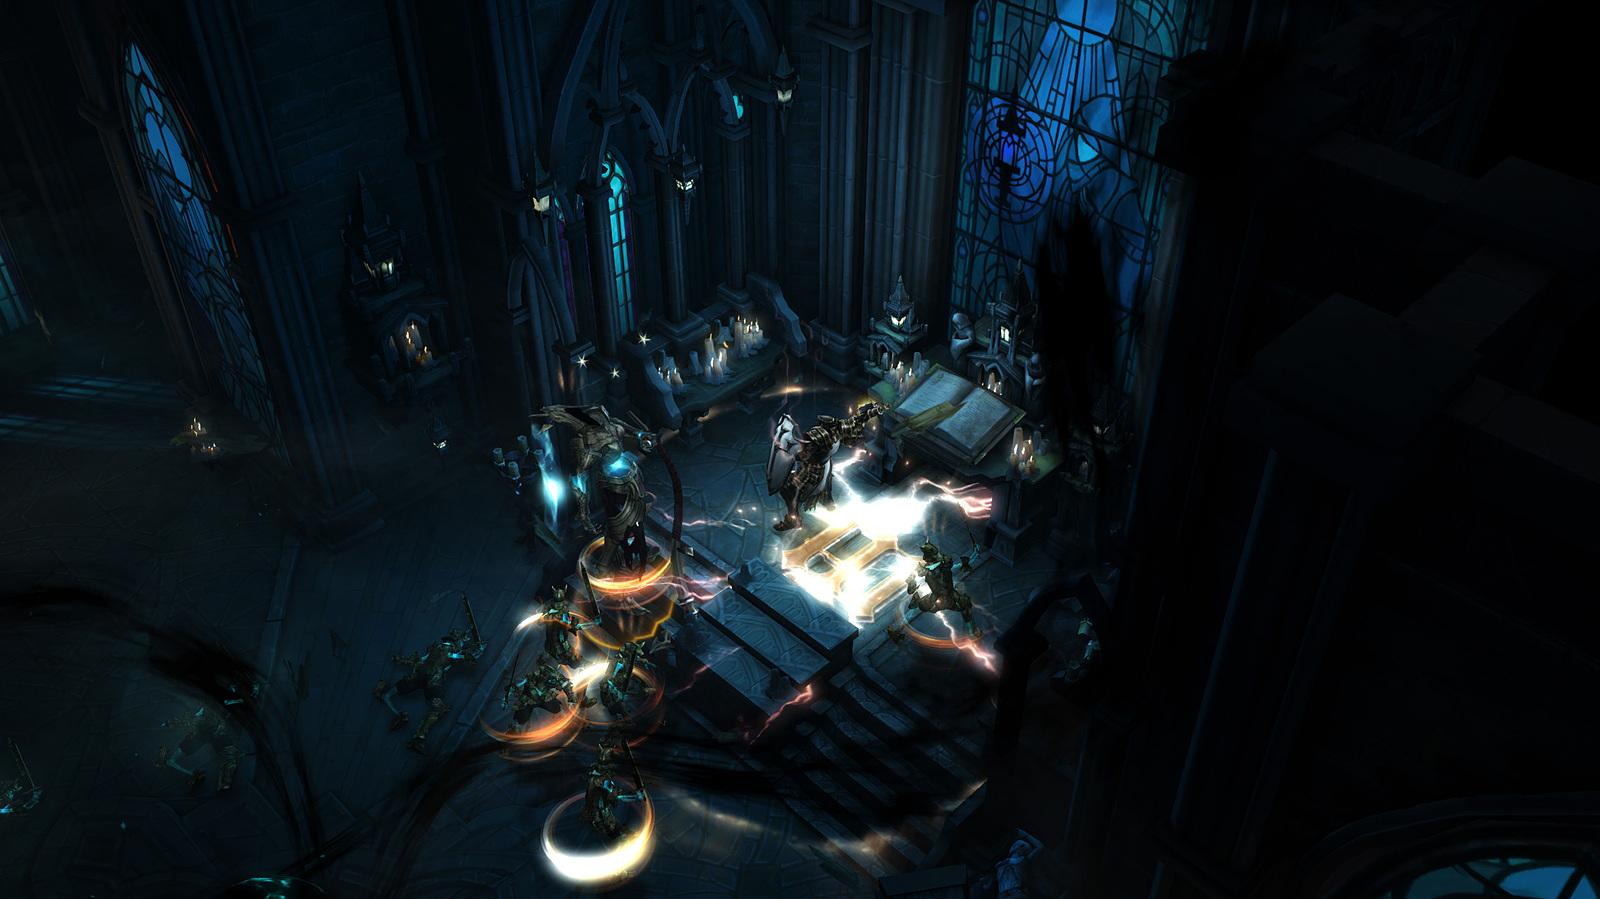 Diablo 3: Reaper of Souls pre-orders include Heroes of the Storm character unlock